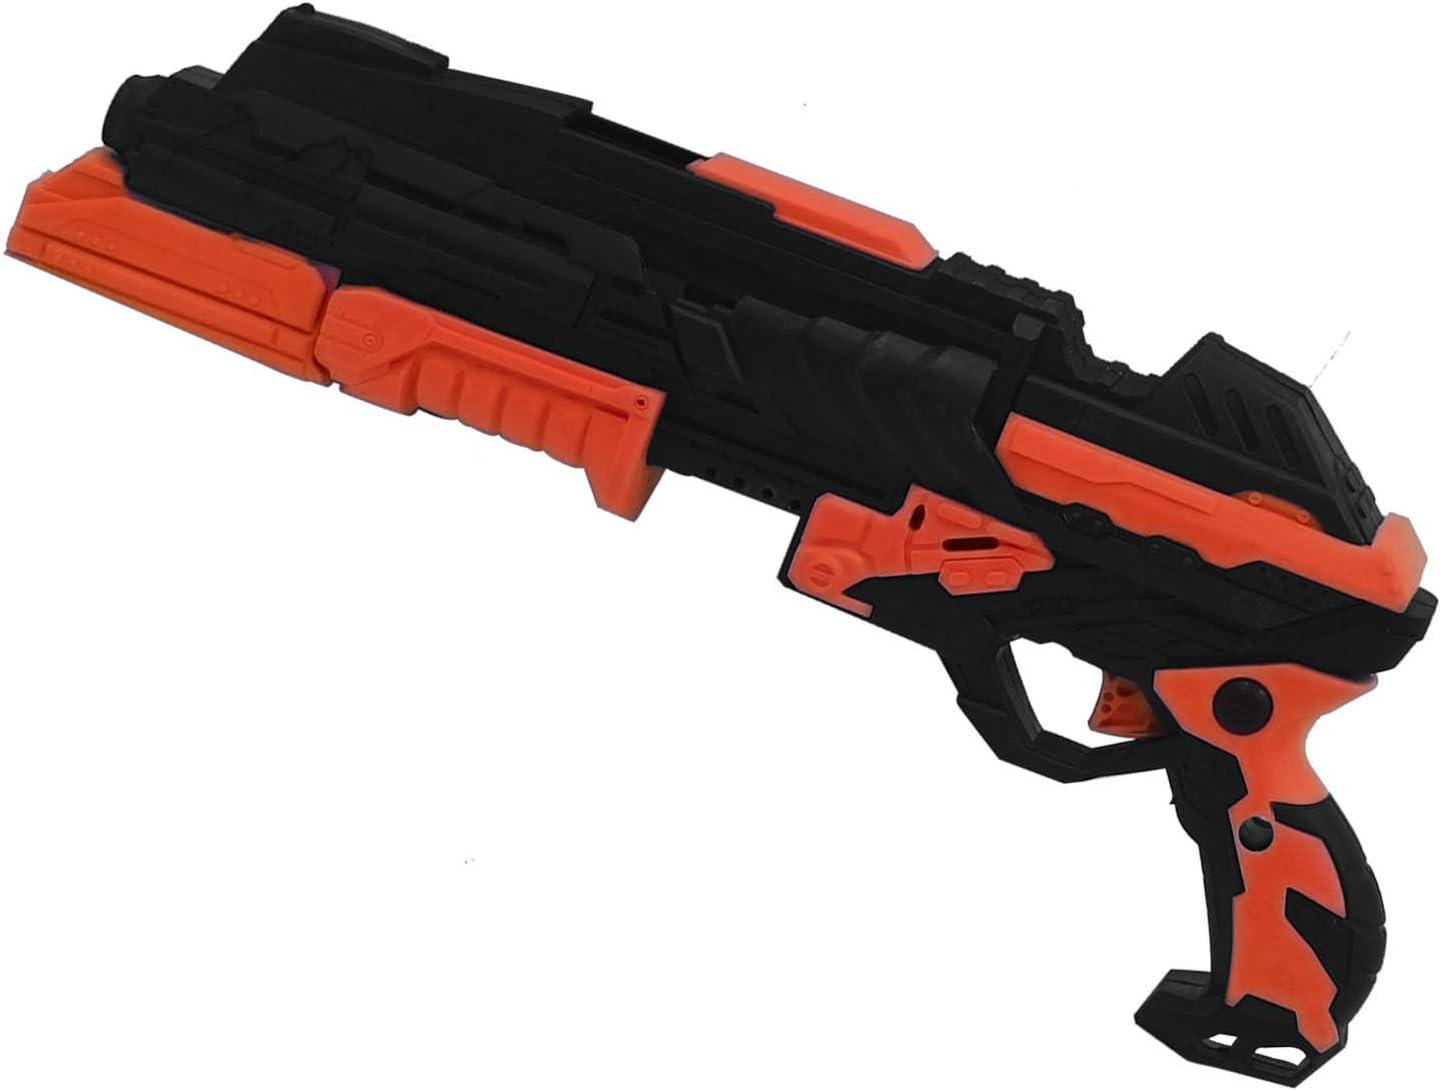 BEETEST 2 en 1 niños plástico espuma suave Dart Gun pistola tiros juego agua cristalina bala de juguete Naranja